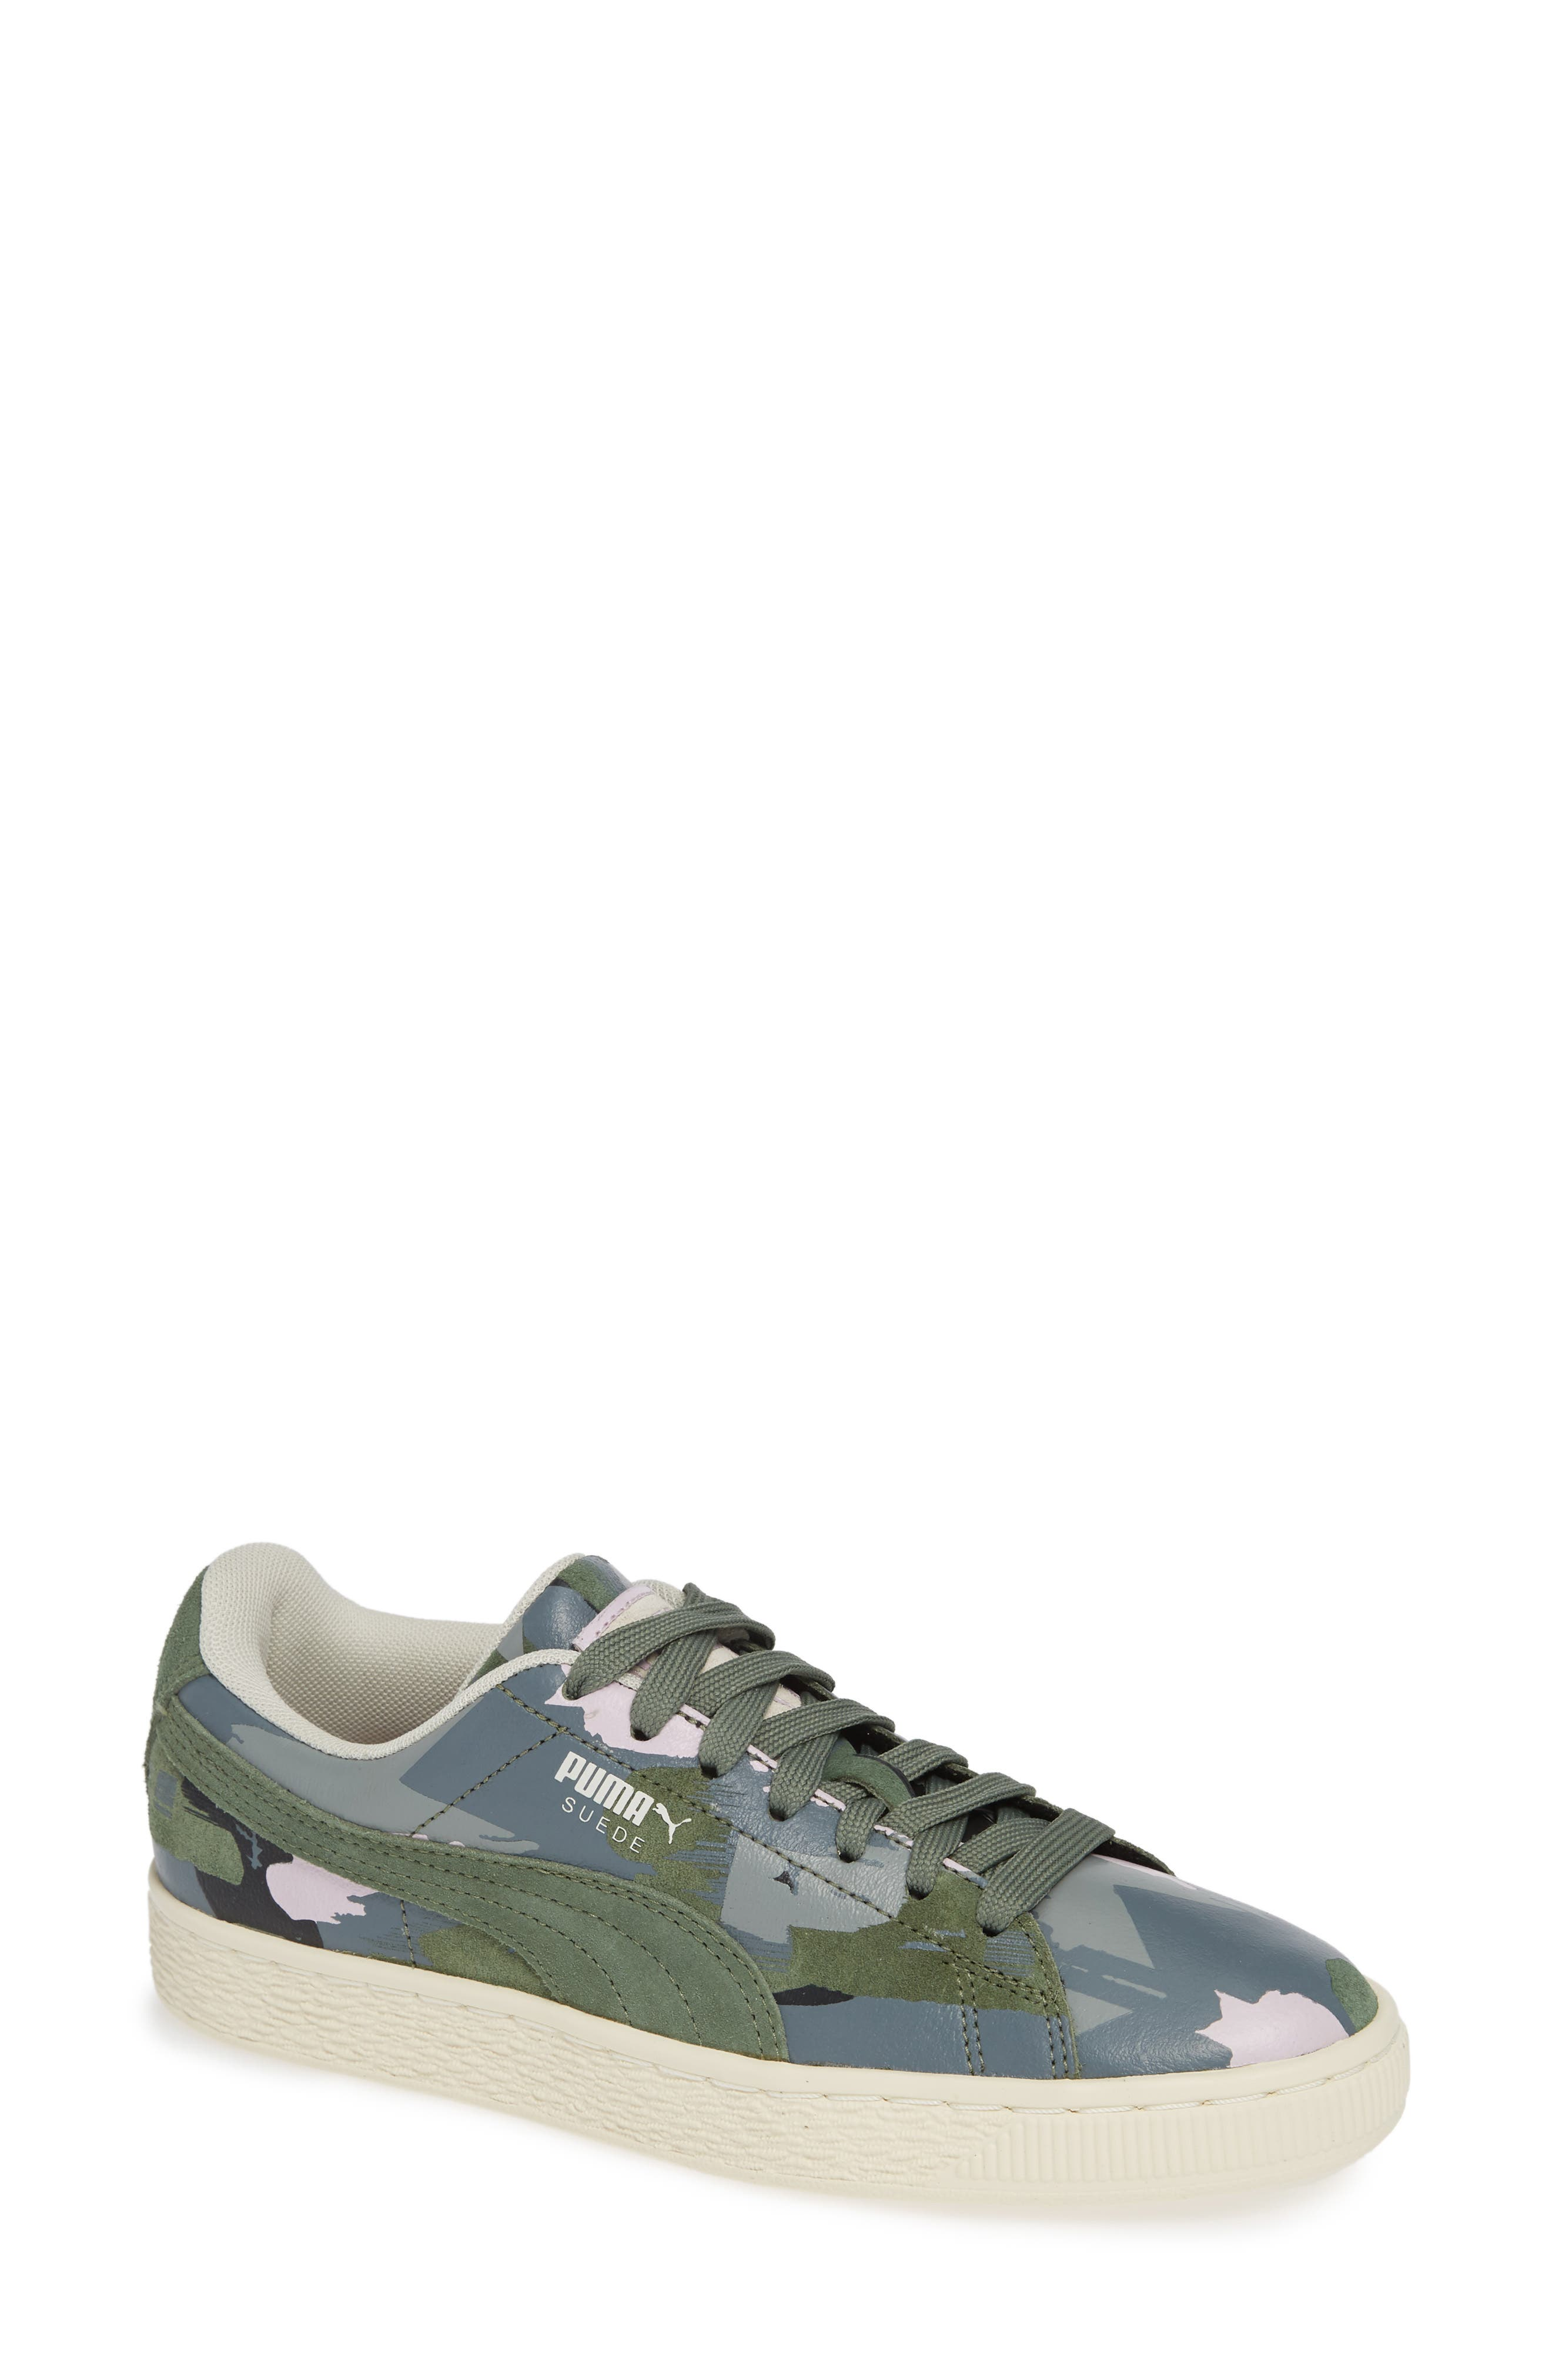 'Suede Classic' Sneaker,                         Main,                         color, Laurel Wreath-White-Orchid